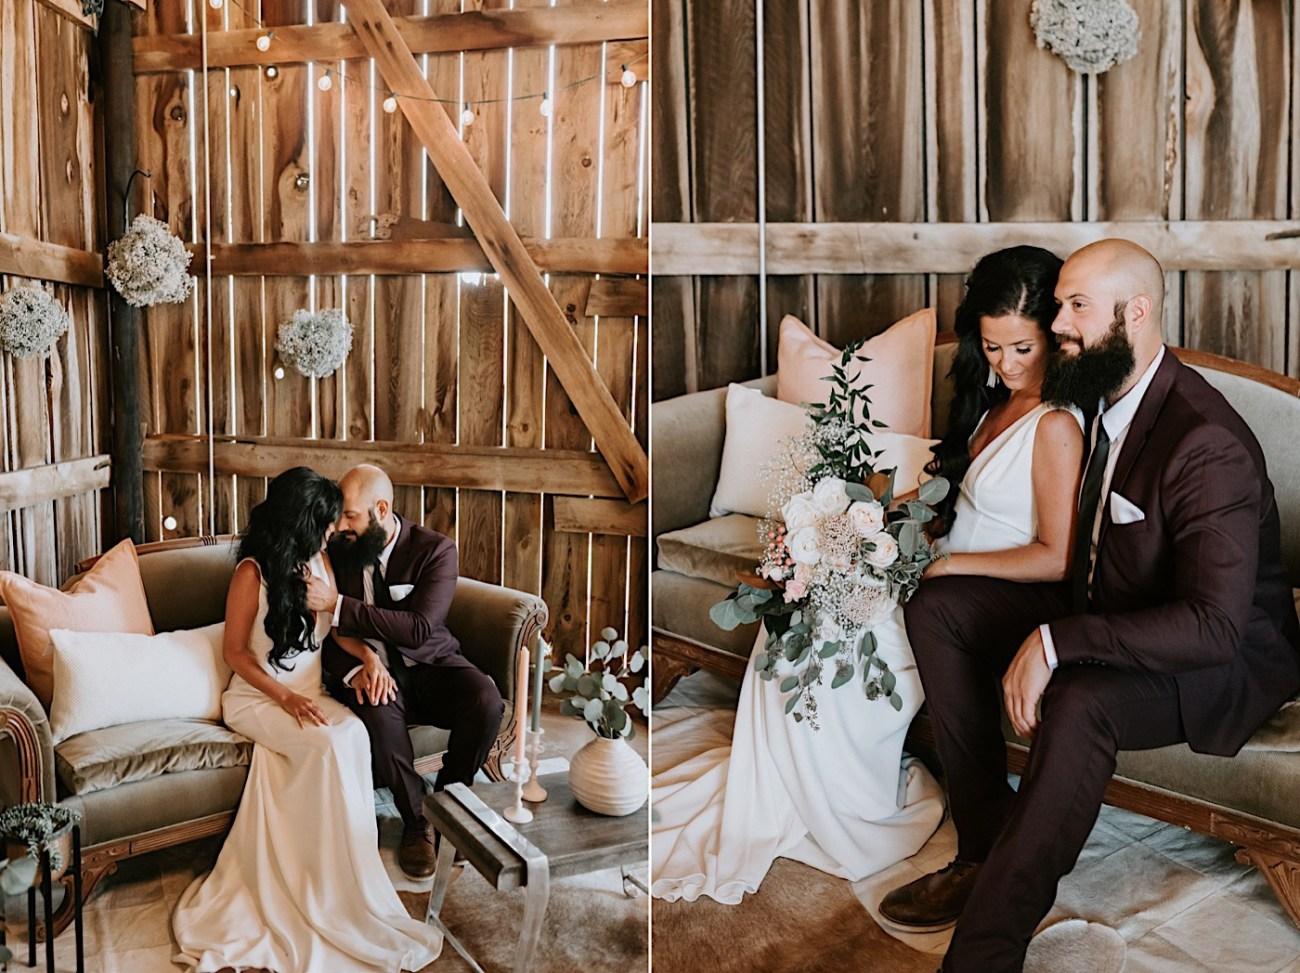 Gilbertsville Farmhouse Wedding Barn Inspiration Wedding Upstate New York Wedding Catskill Hudsonvalley Wedding 19